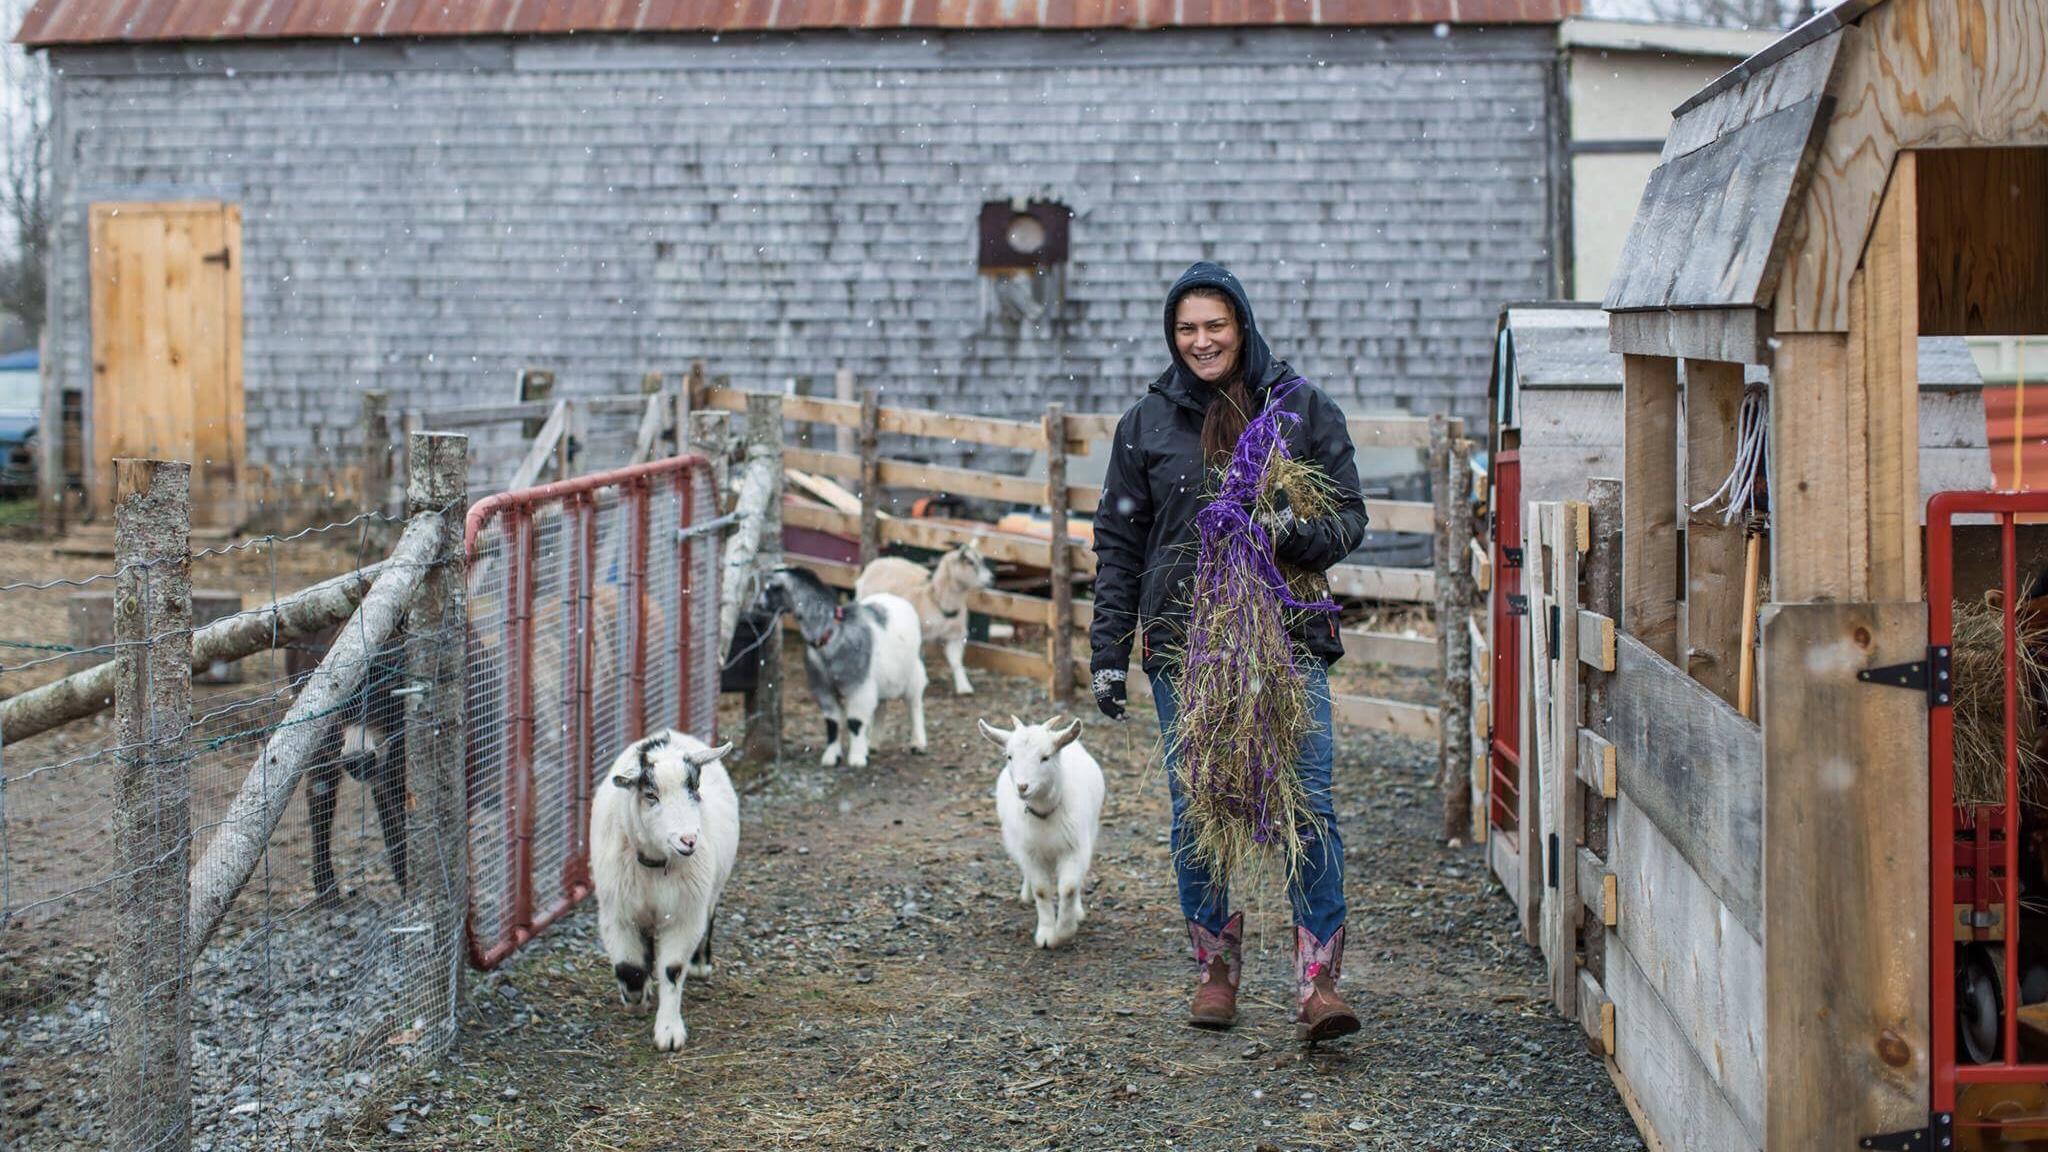 Charlotte feeds goats.